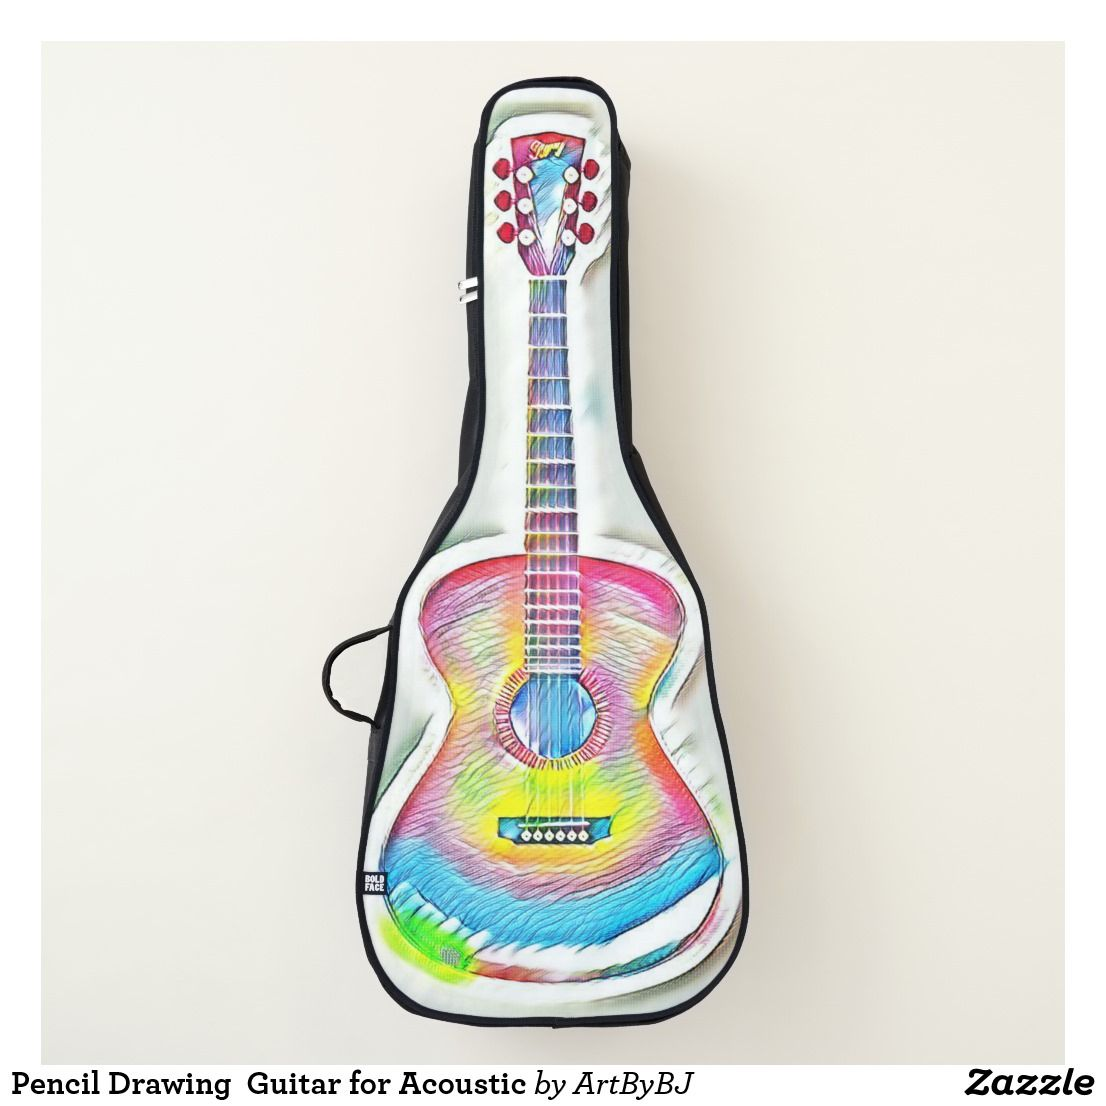 Pencil Drawing Guitar For Acoustic Guitar Case Zazzle Com Guitar Case Acoustic Guitar Case Acoustic Guitar